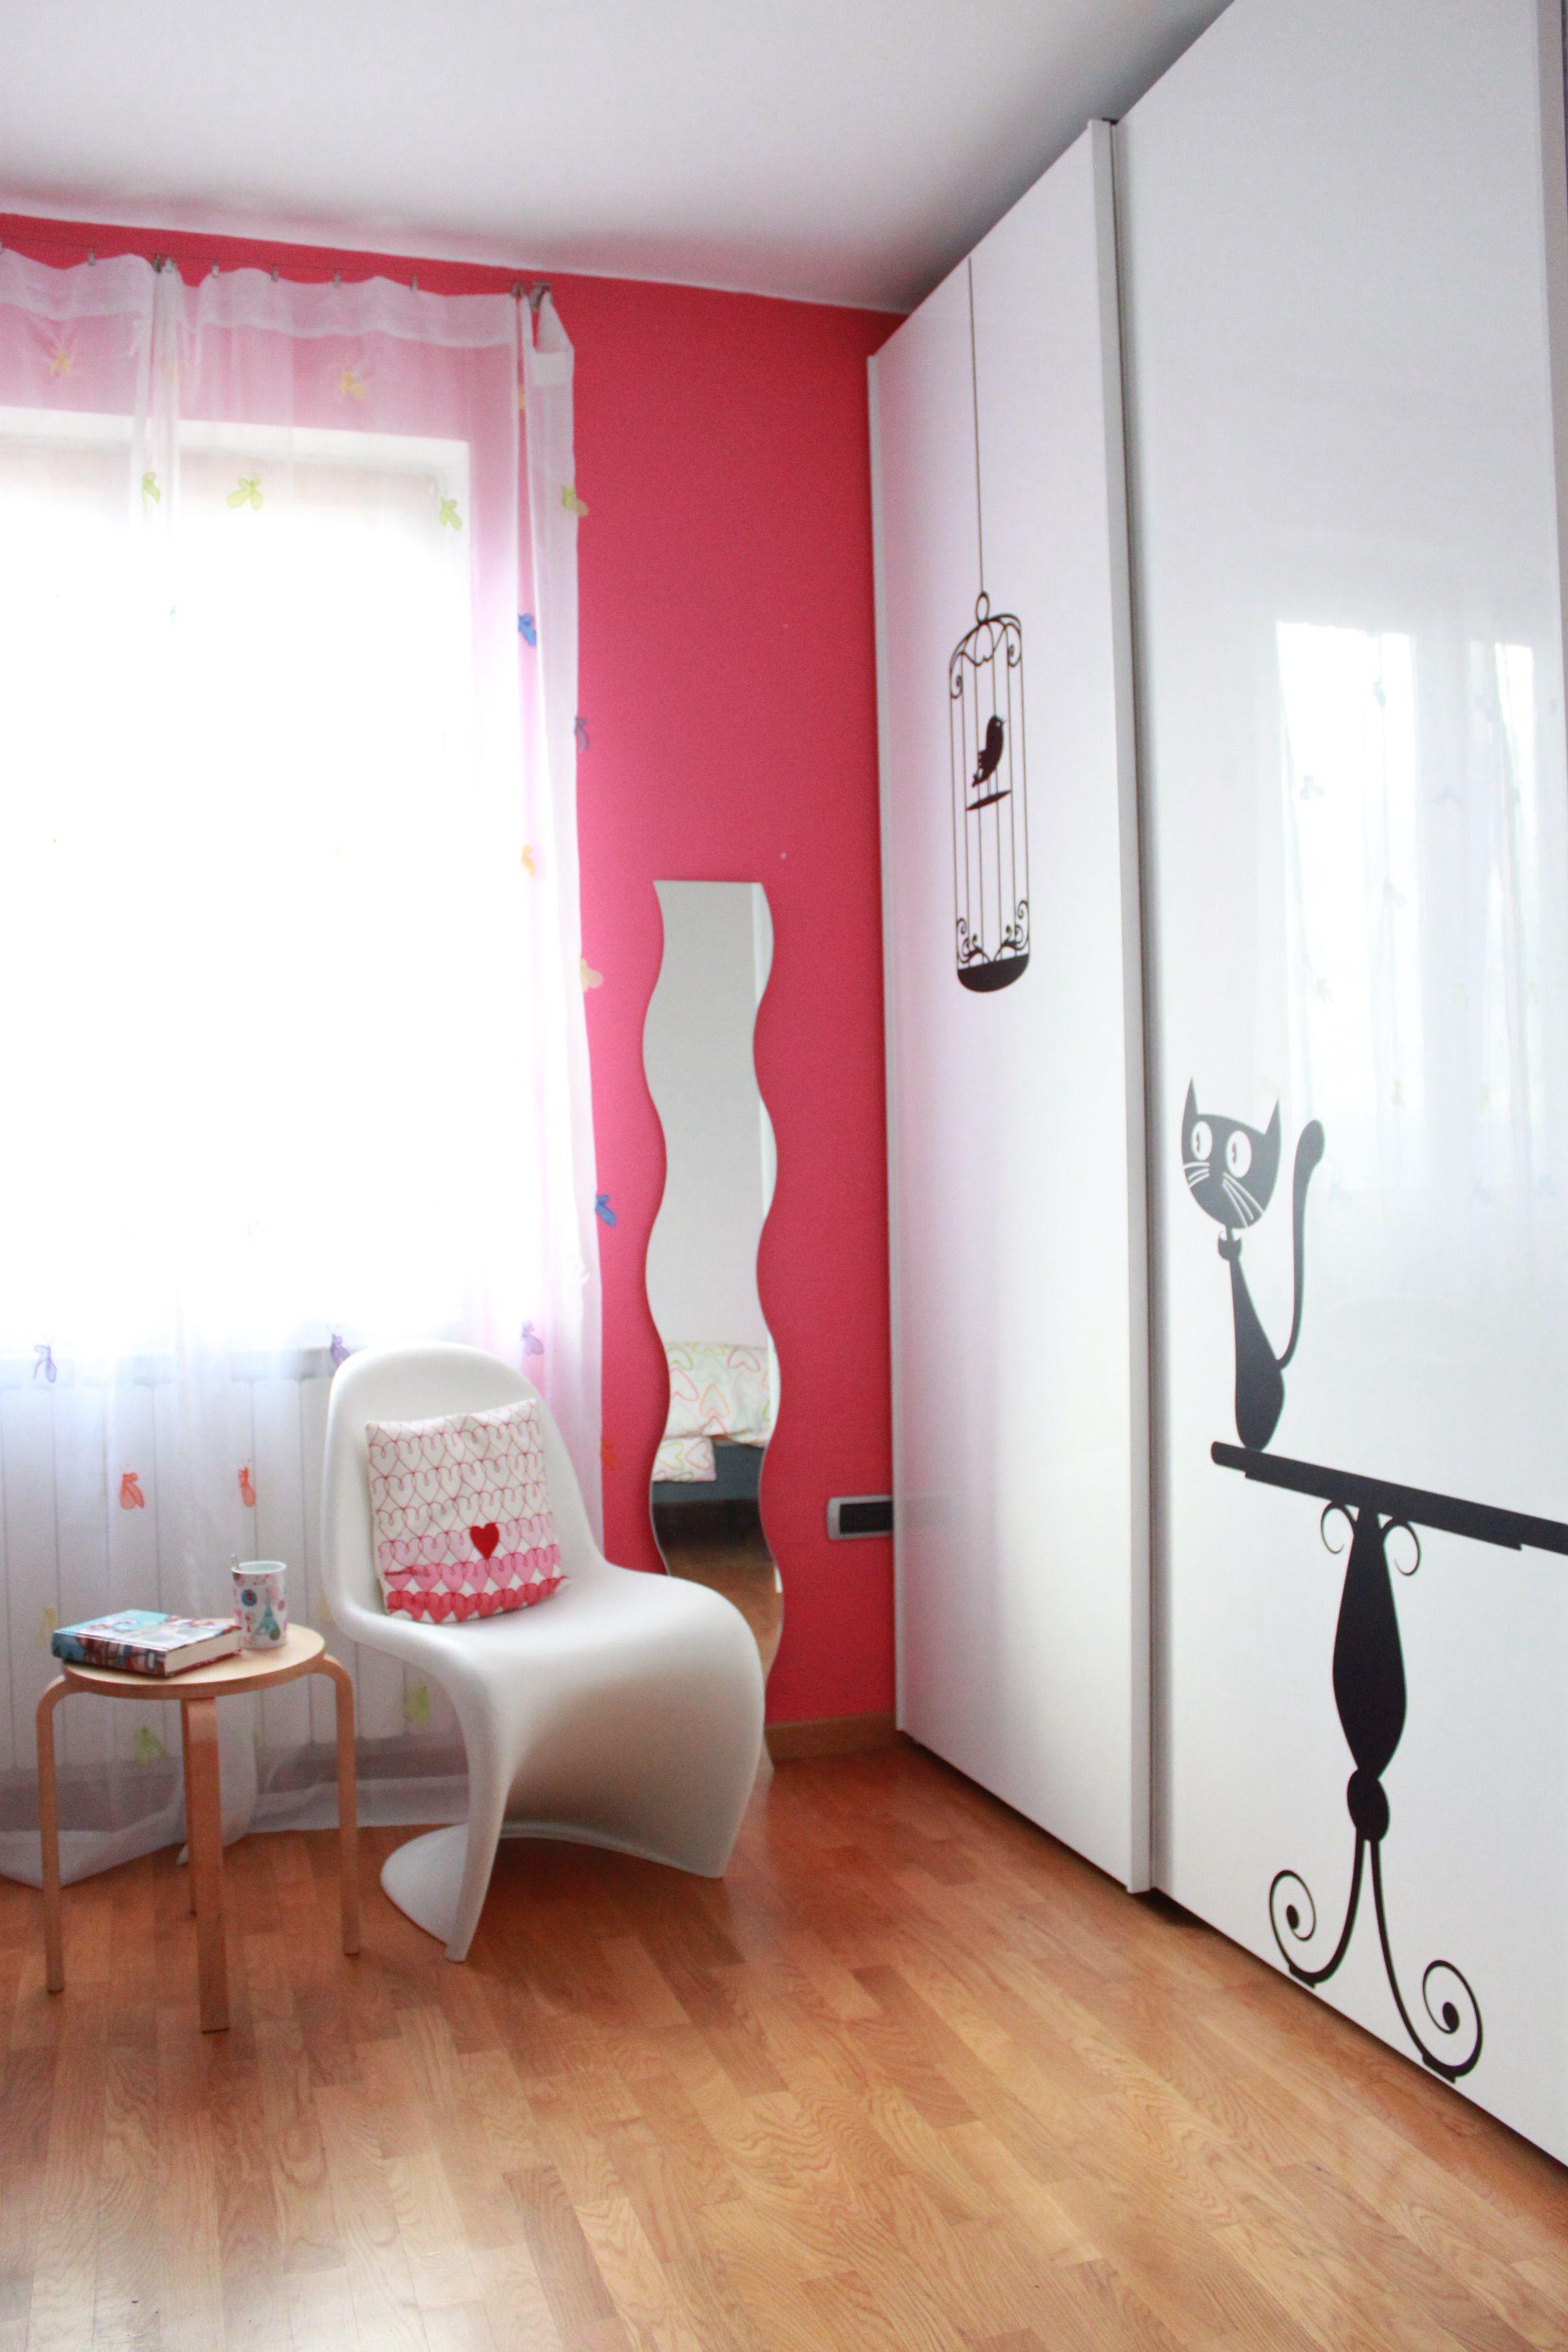 Restyling di una camera per una ragazza. L'armadio bianco